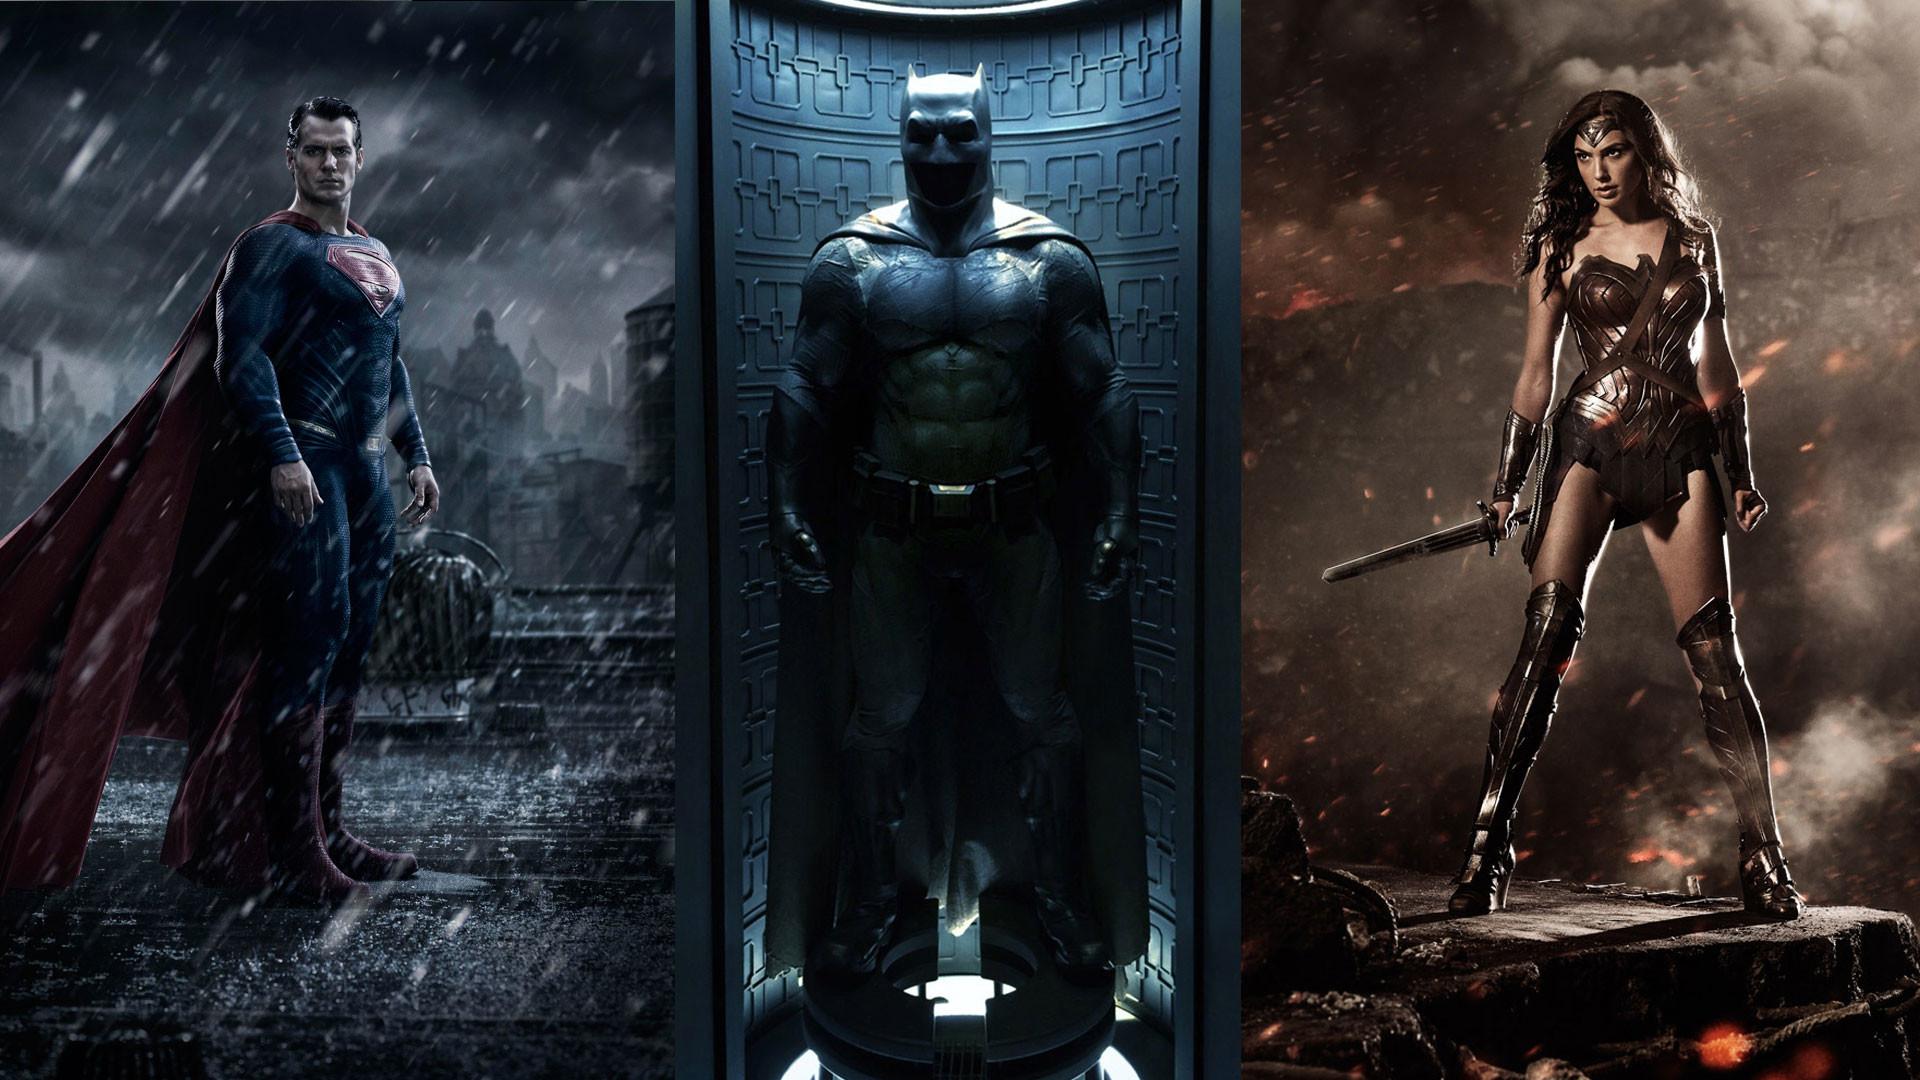 Superman vs Batman & Wonder Woman Wallpaper HD